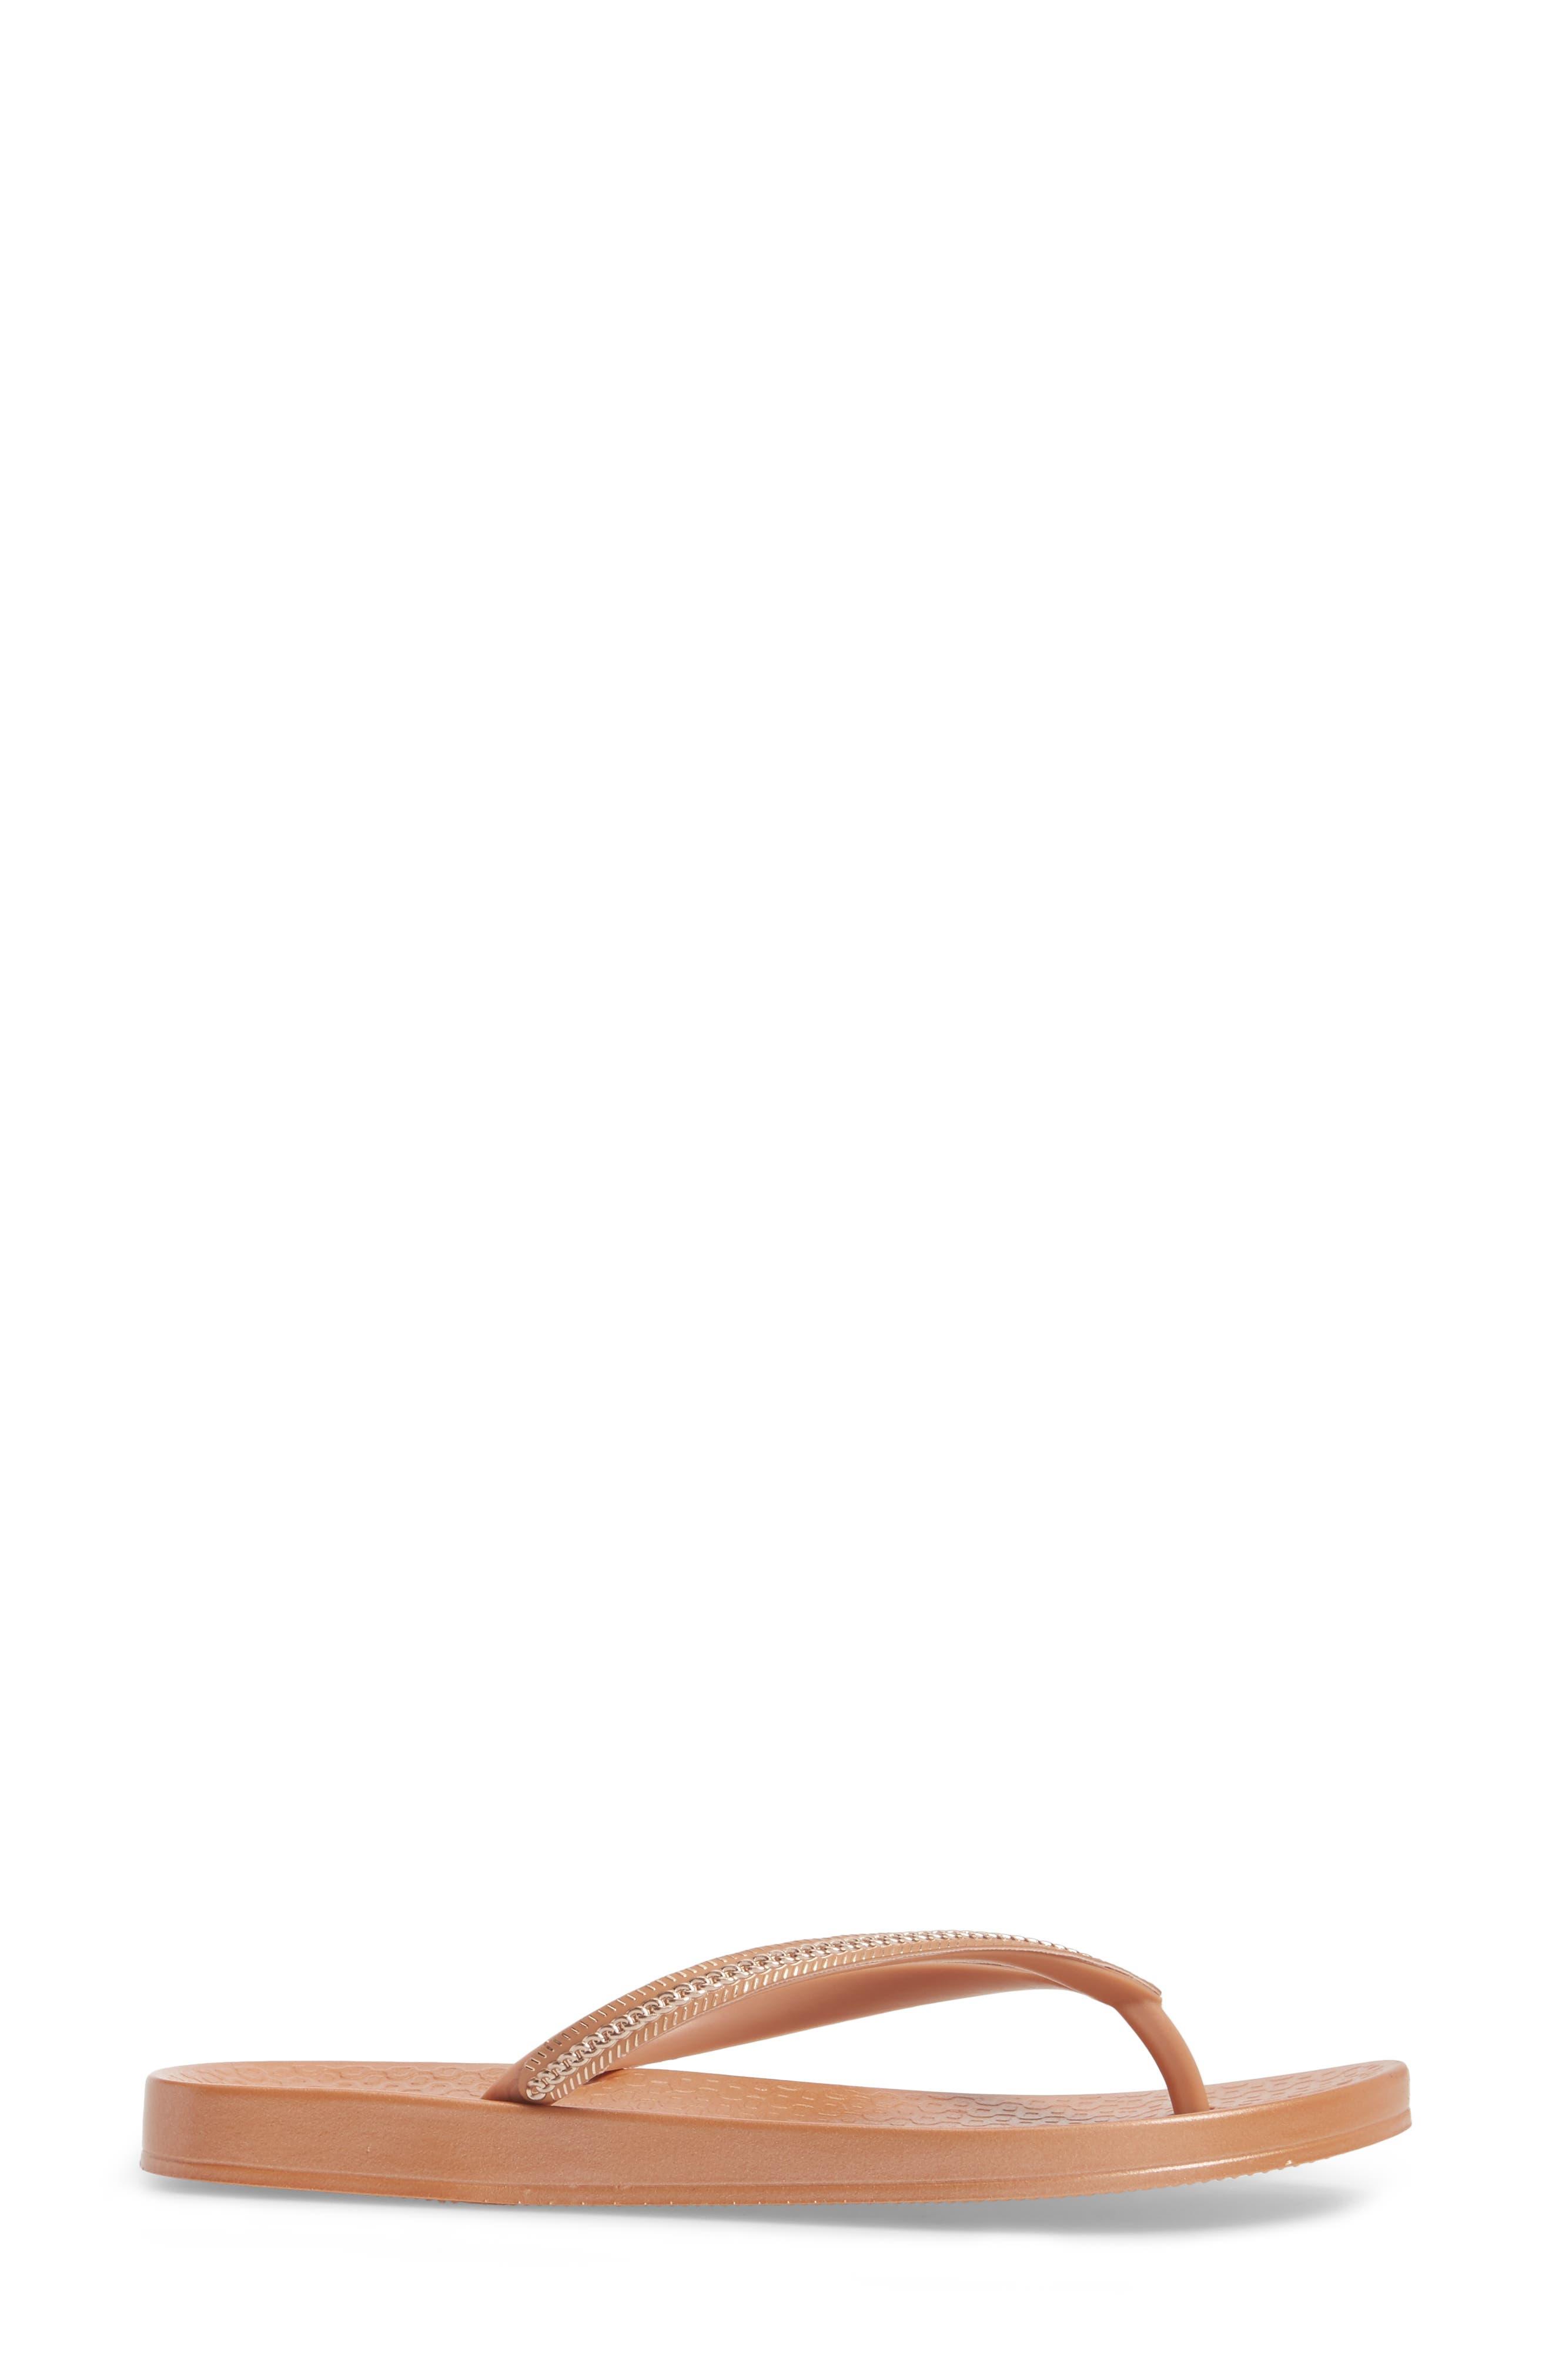 Alternate Image 3  - Ipanema Ana Flip Flop (Women)